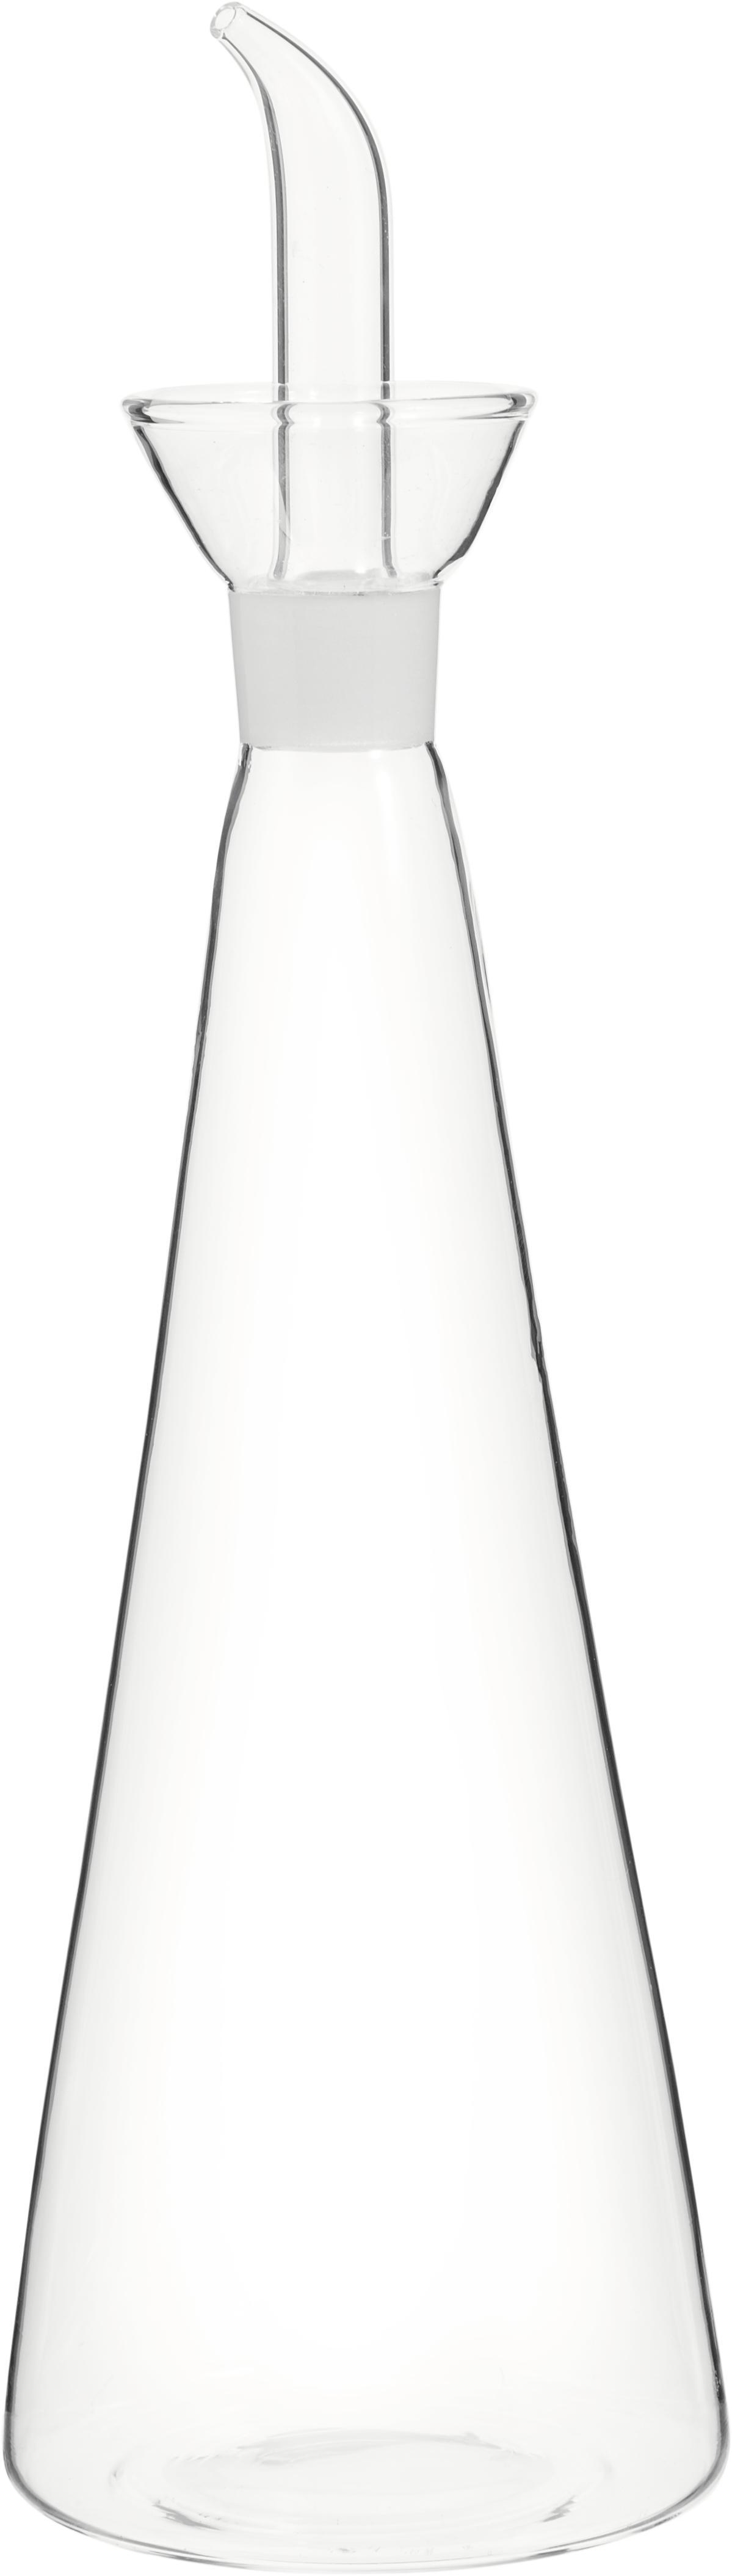 Azijn- en oliedispenser Paul, Glas, Transparant, H 29 cm